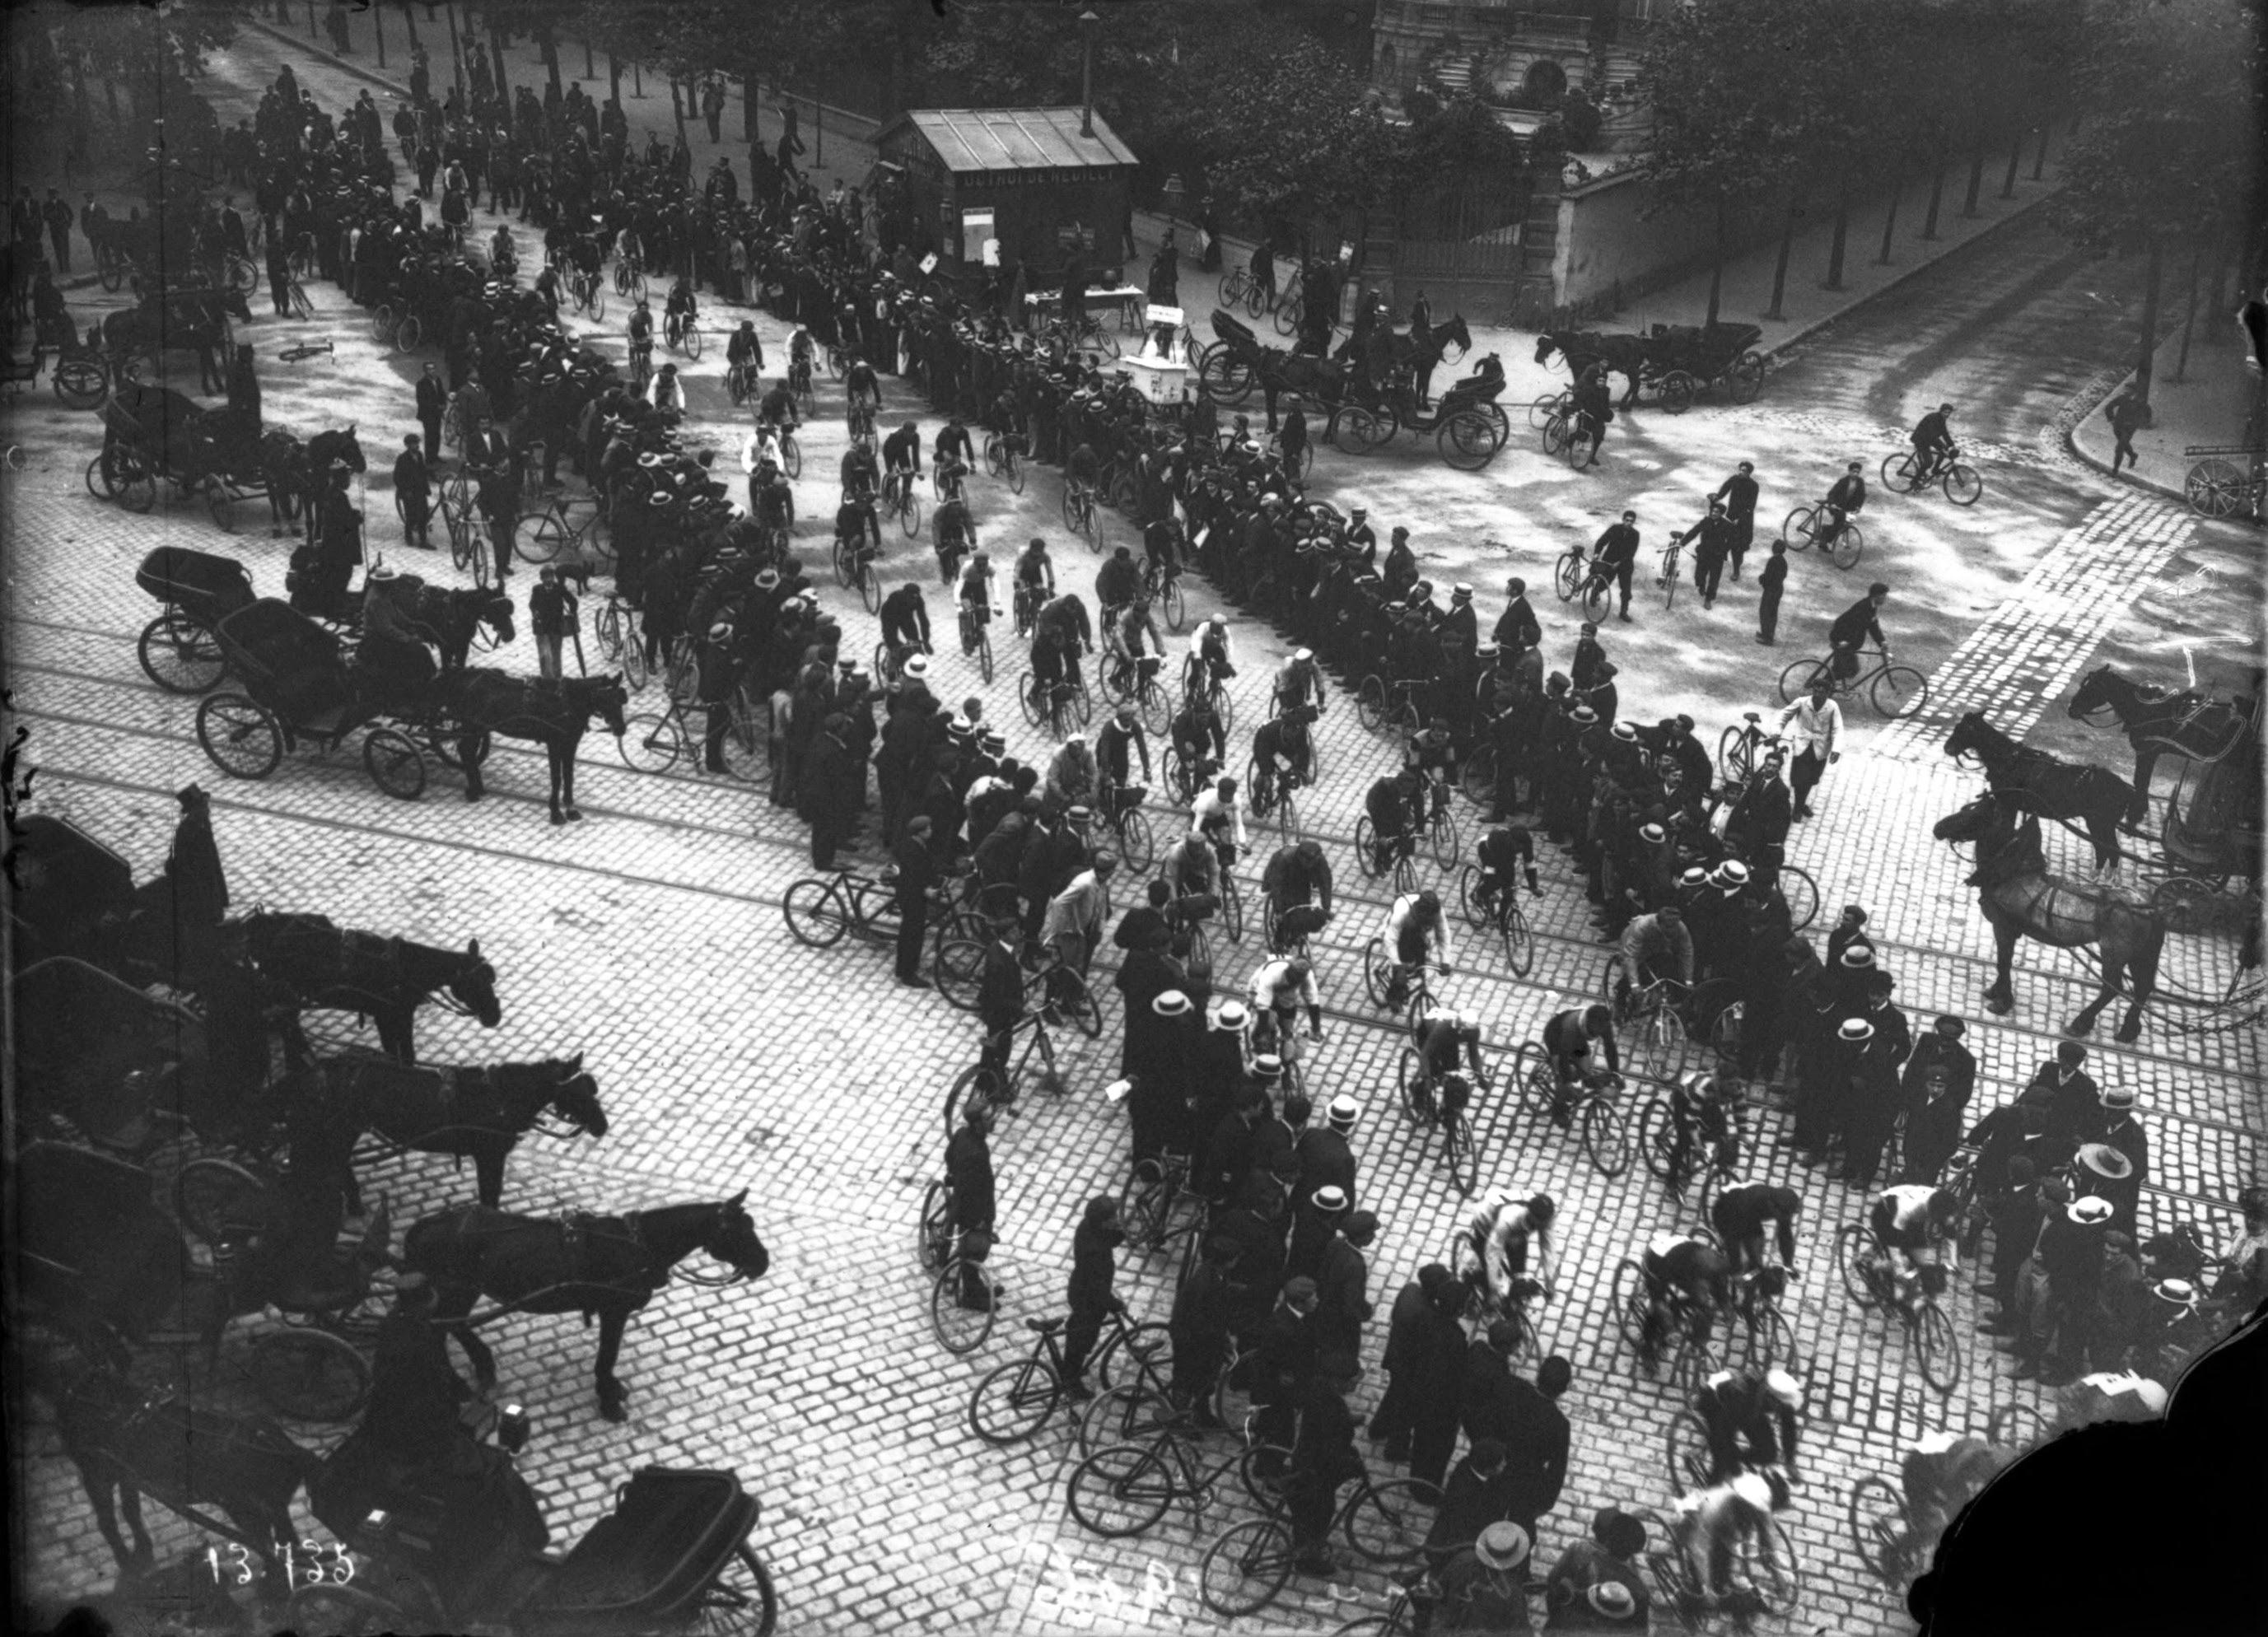 http://upload.wikimedia.org/wikipedia/commons/b/ba/Tour_de_France_1906_(01).jpg